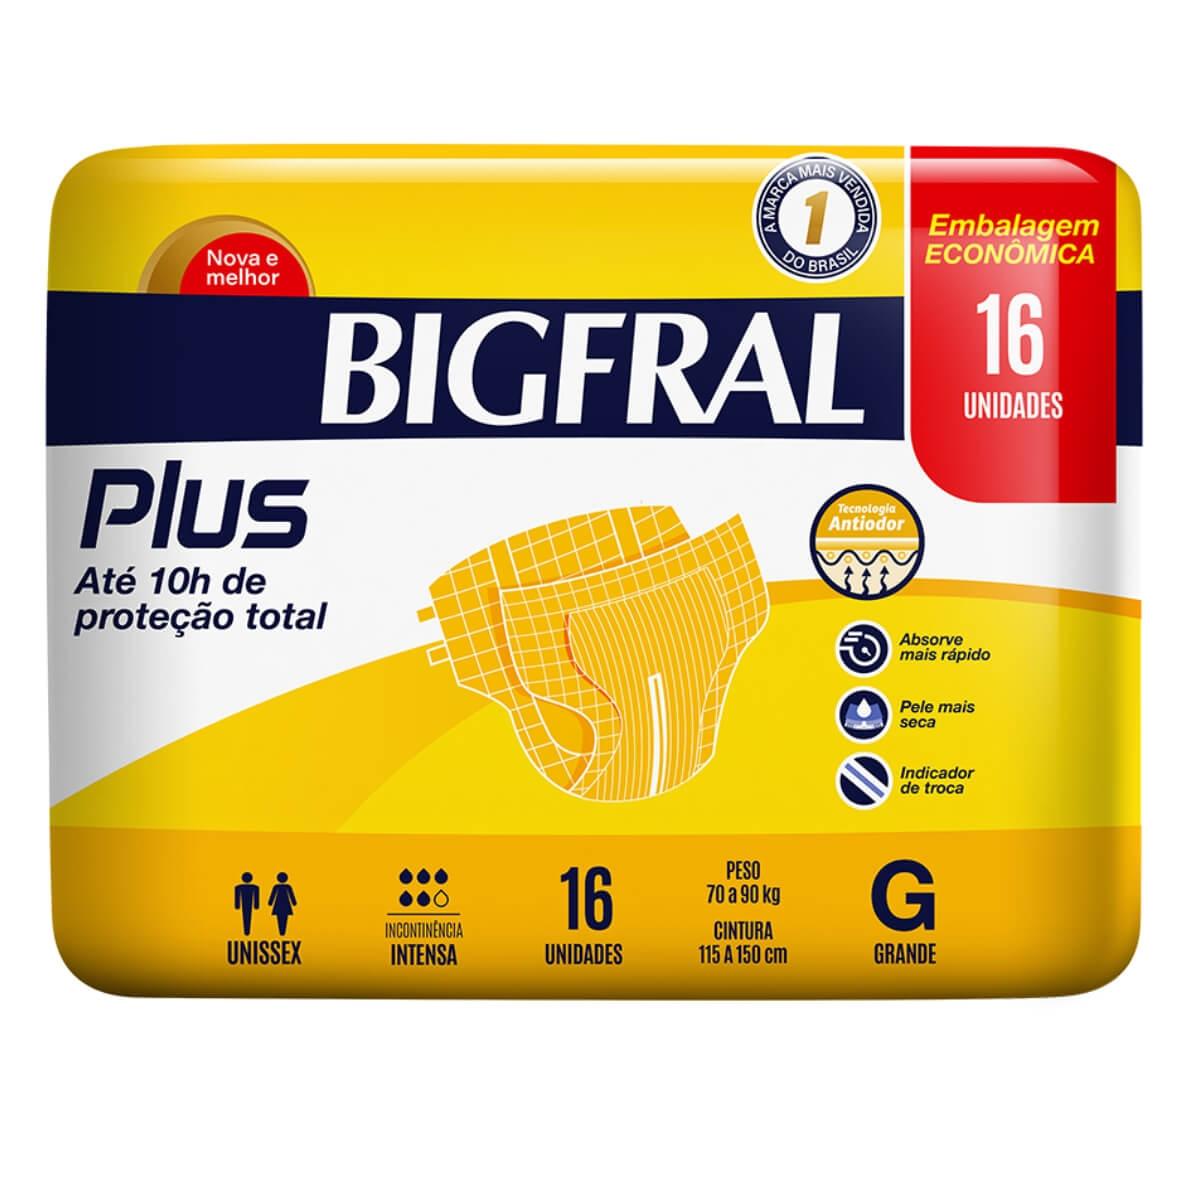 Fralda Geriátrica BifFral Plus G com 16 unidades Bigfral 16 Tiras